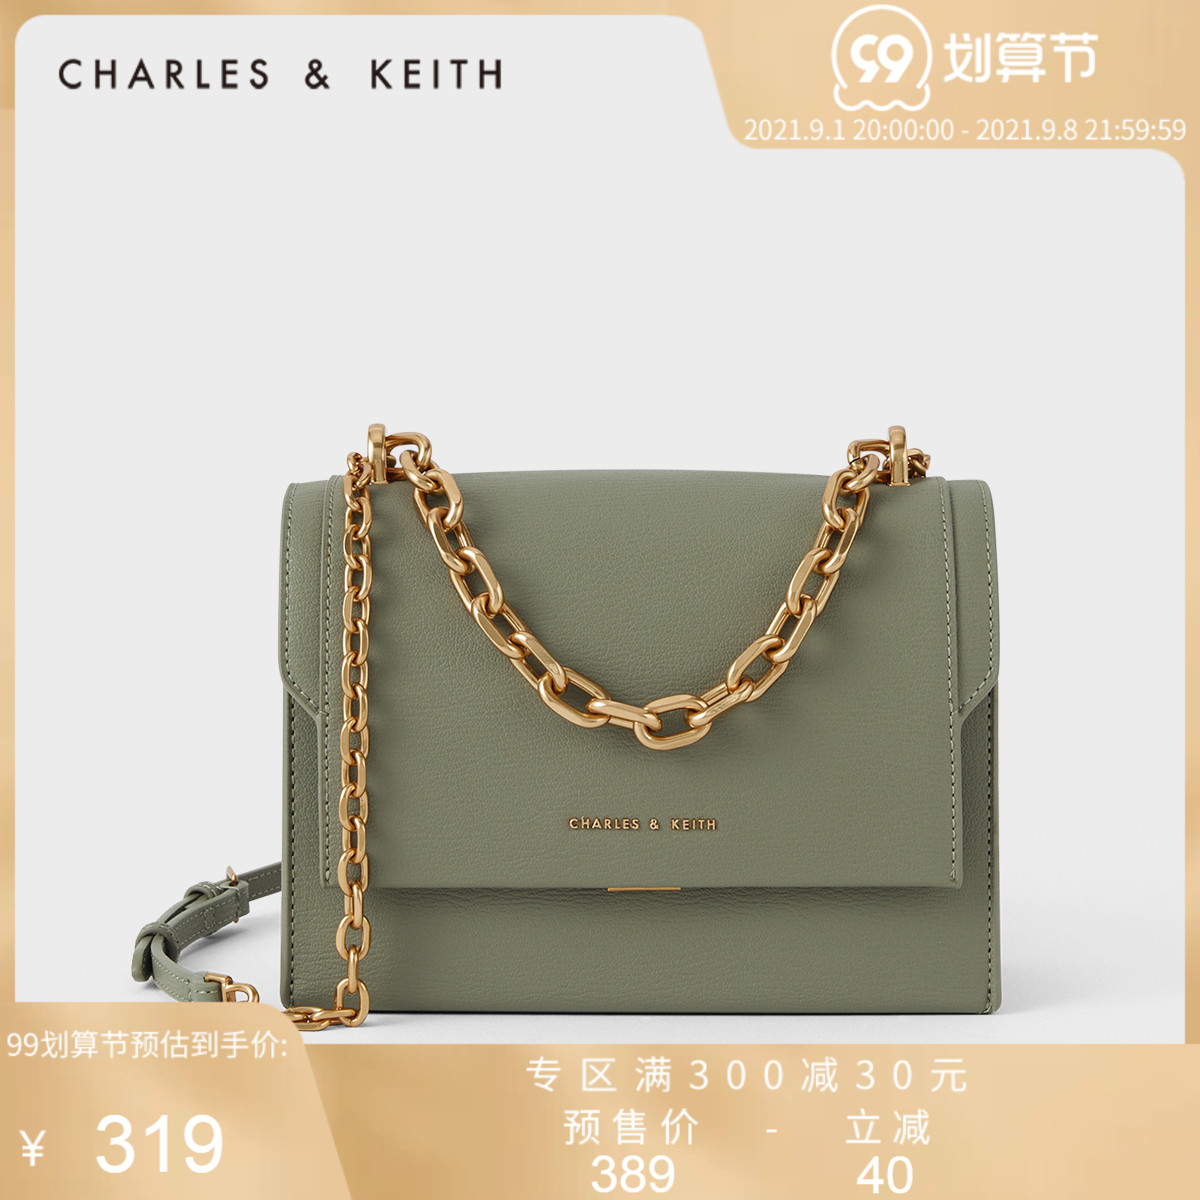 CHARLES&KEITH CK2-80701061-1 女士单肩包